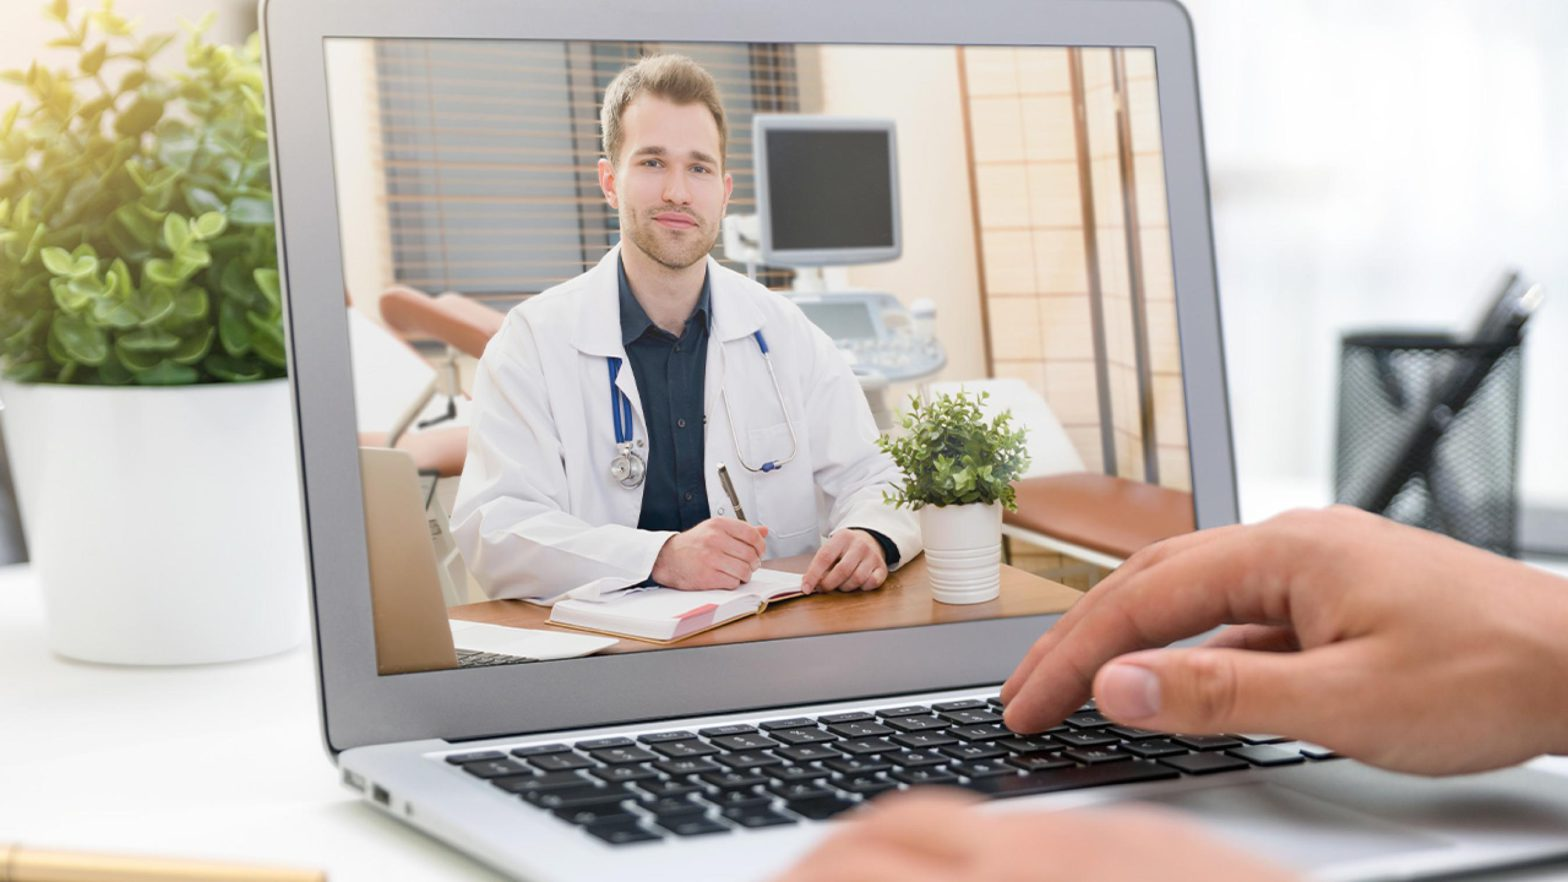 Telemedicina: como manter o atendimento humanizado em teleconsultas?